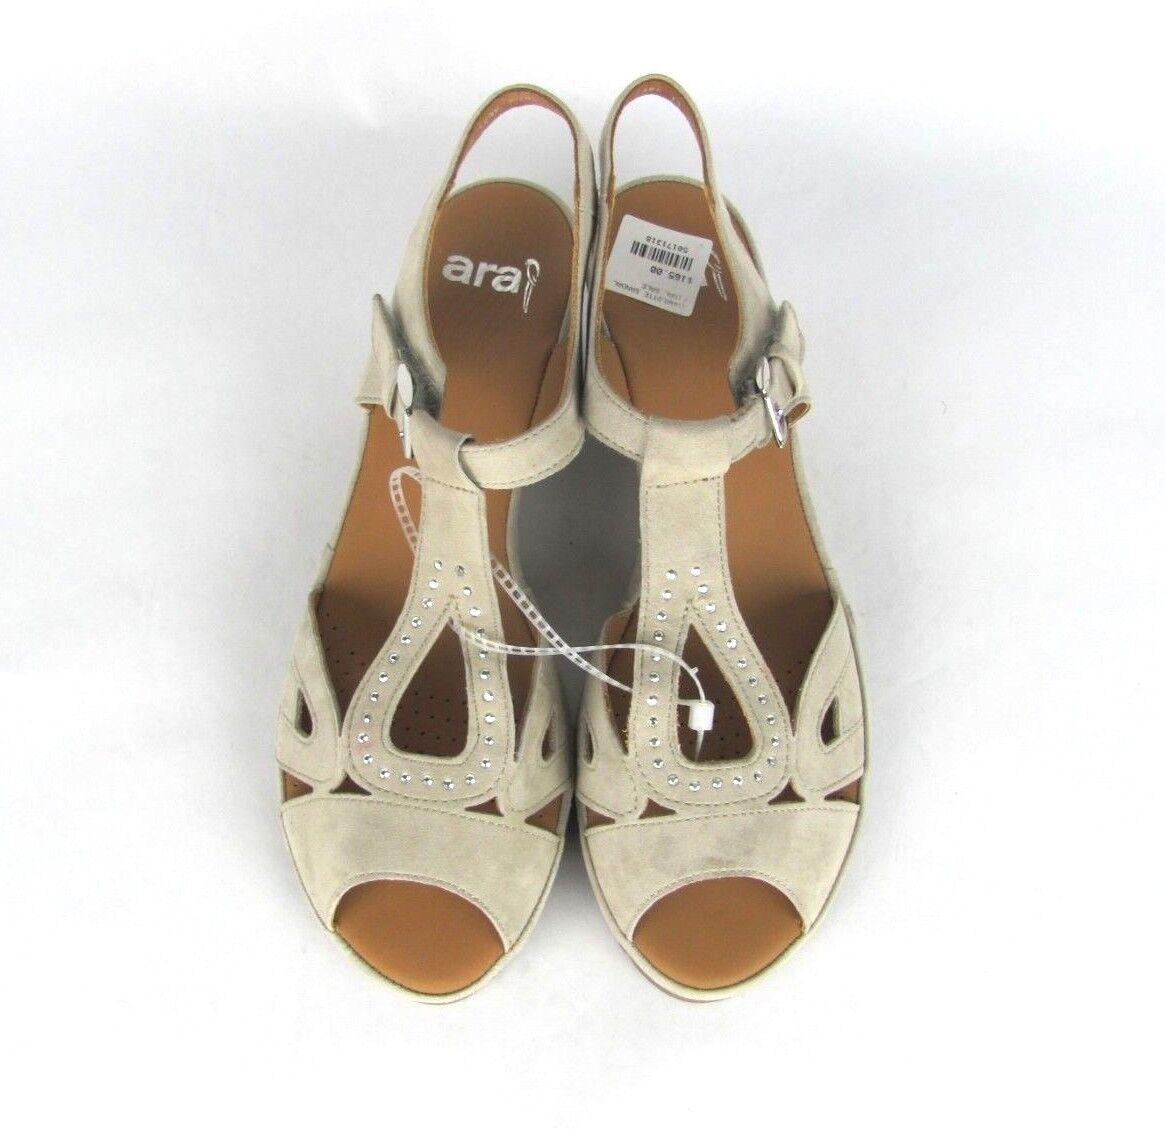 Ara Womens Womens Womens 6 Charlotte T Strap Wedge Lino Suede Sandals e8353a